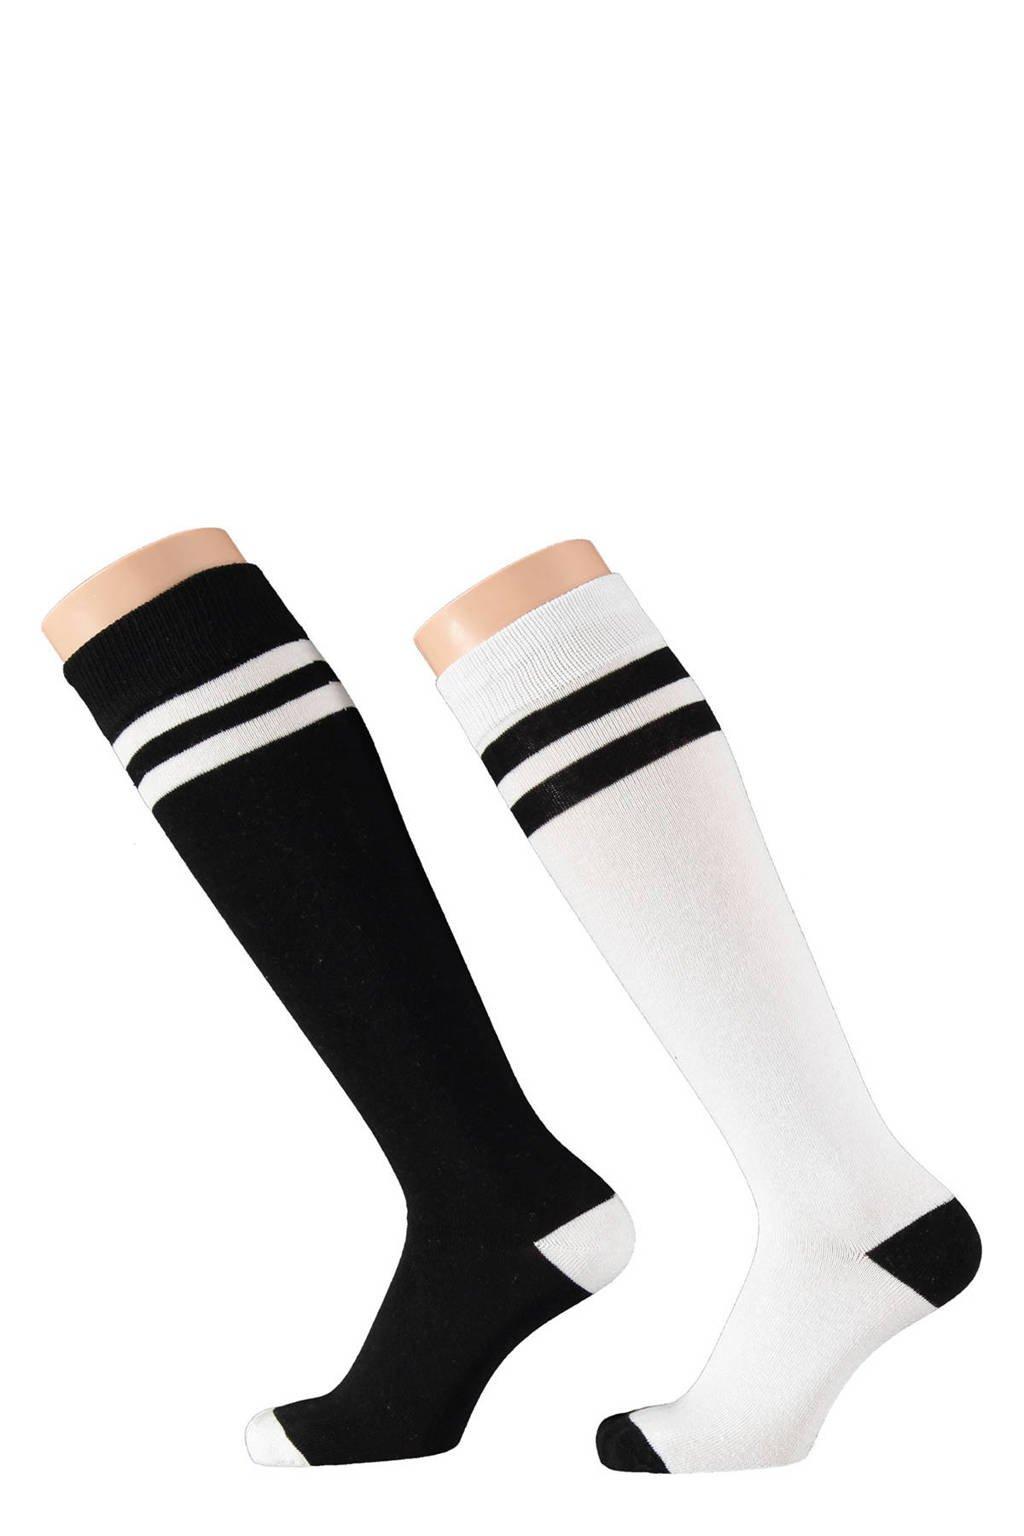 Apollo kinder kniekousen - set van 2 streepprint zwart/wit, Zwart/wit